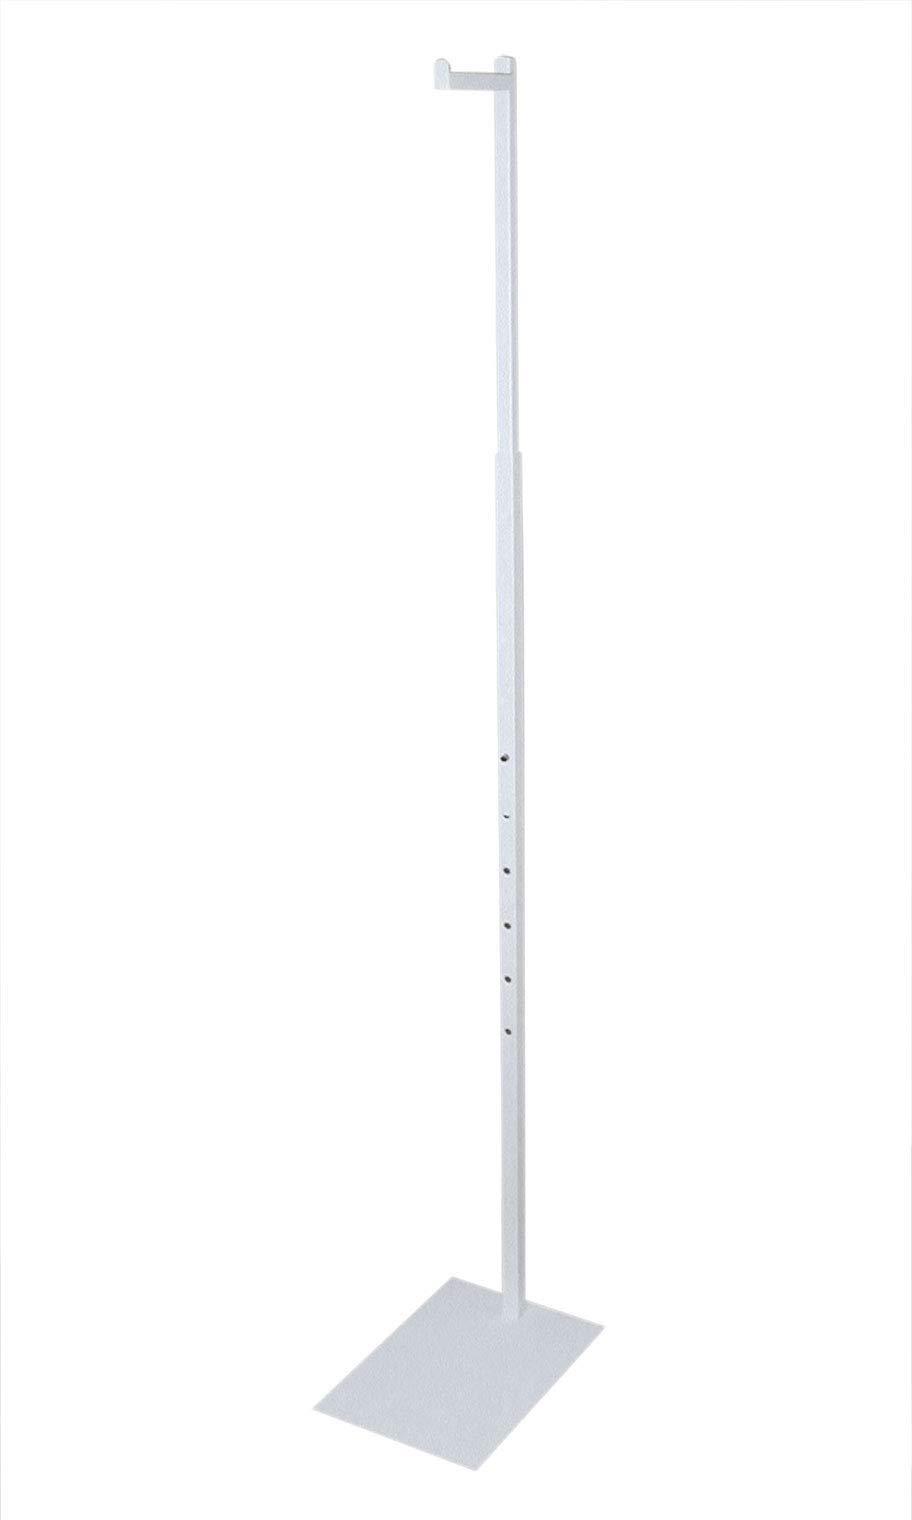 SSWBasics White Adjustable Single Costumer (Adjustable from 48'' to 72'')